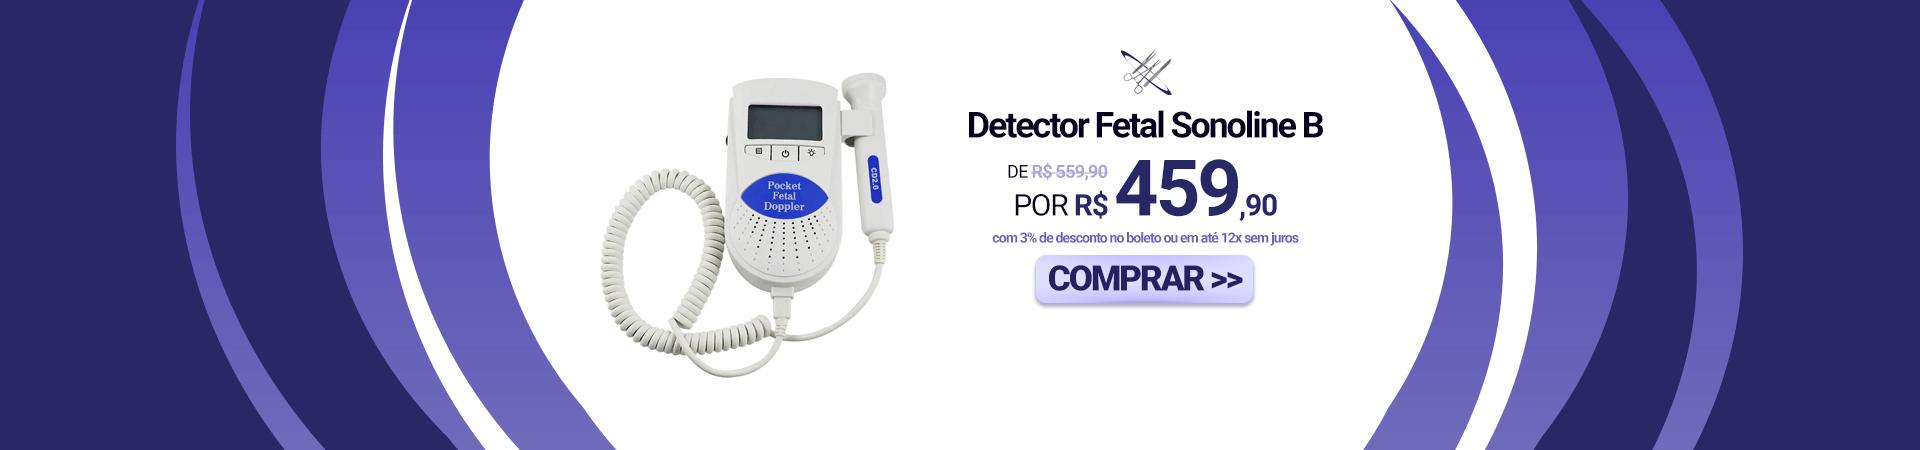 Detector Fetal Sonoline B